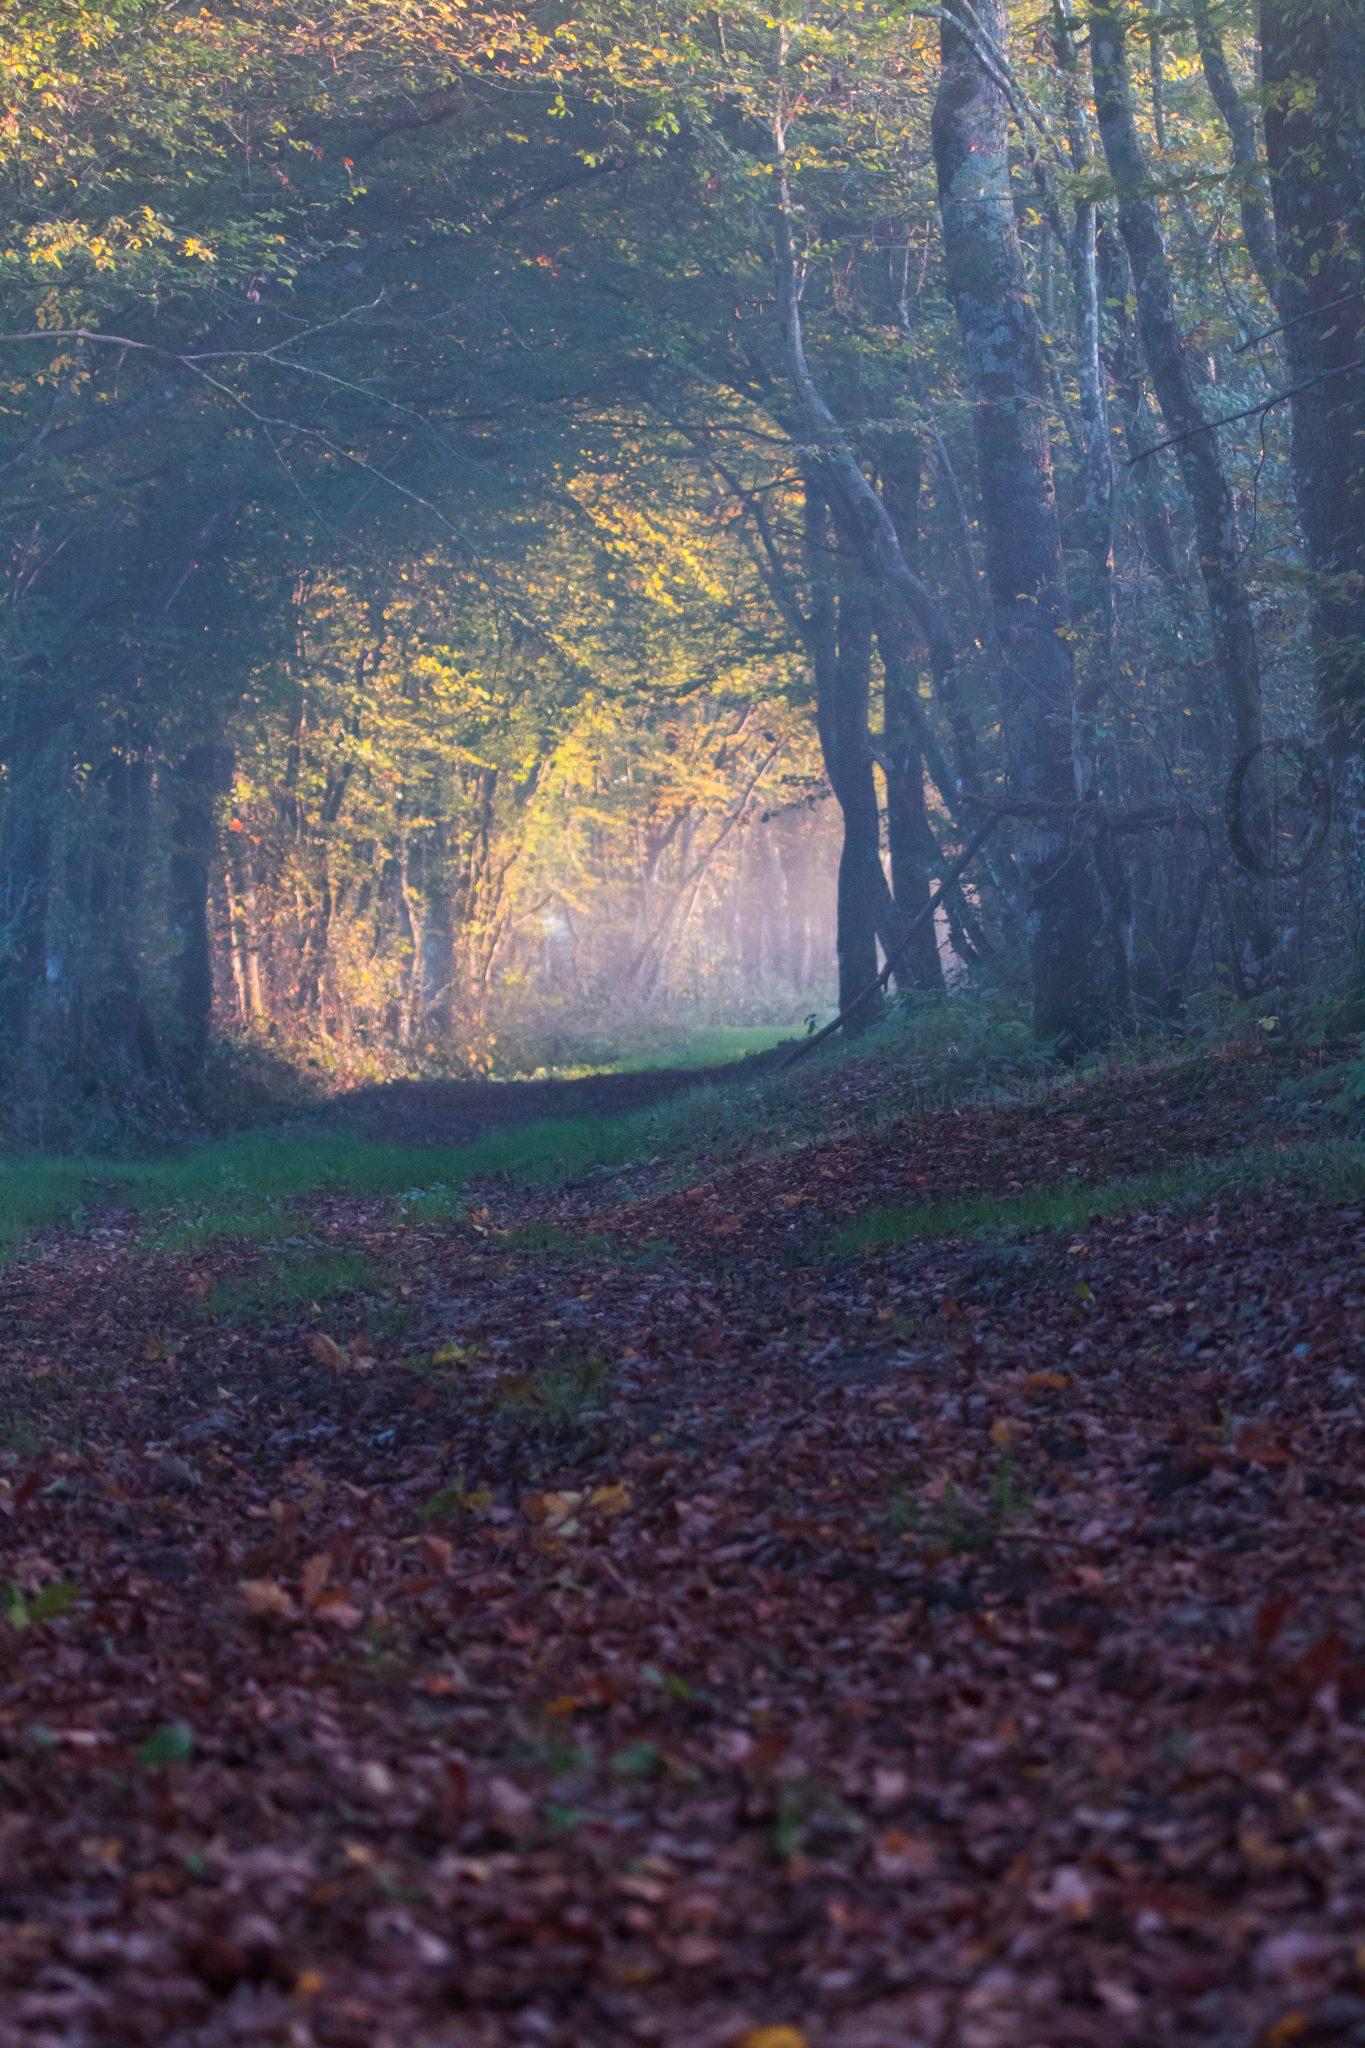 Paysage - Chemin forestier 2 1 151017 copie